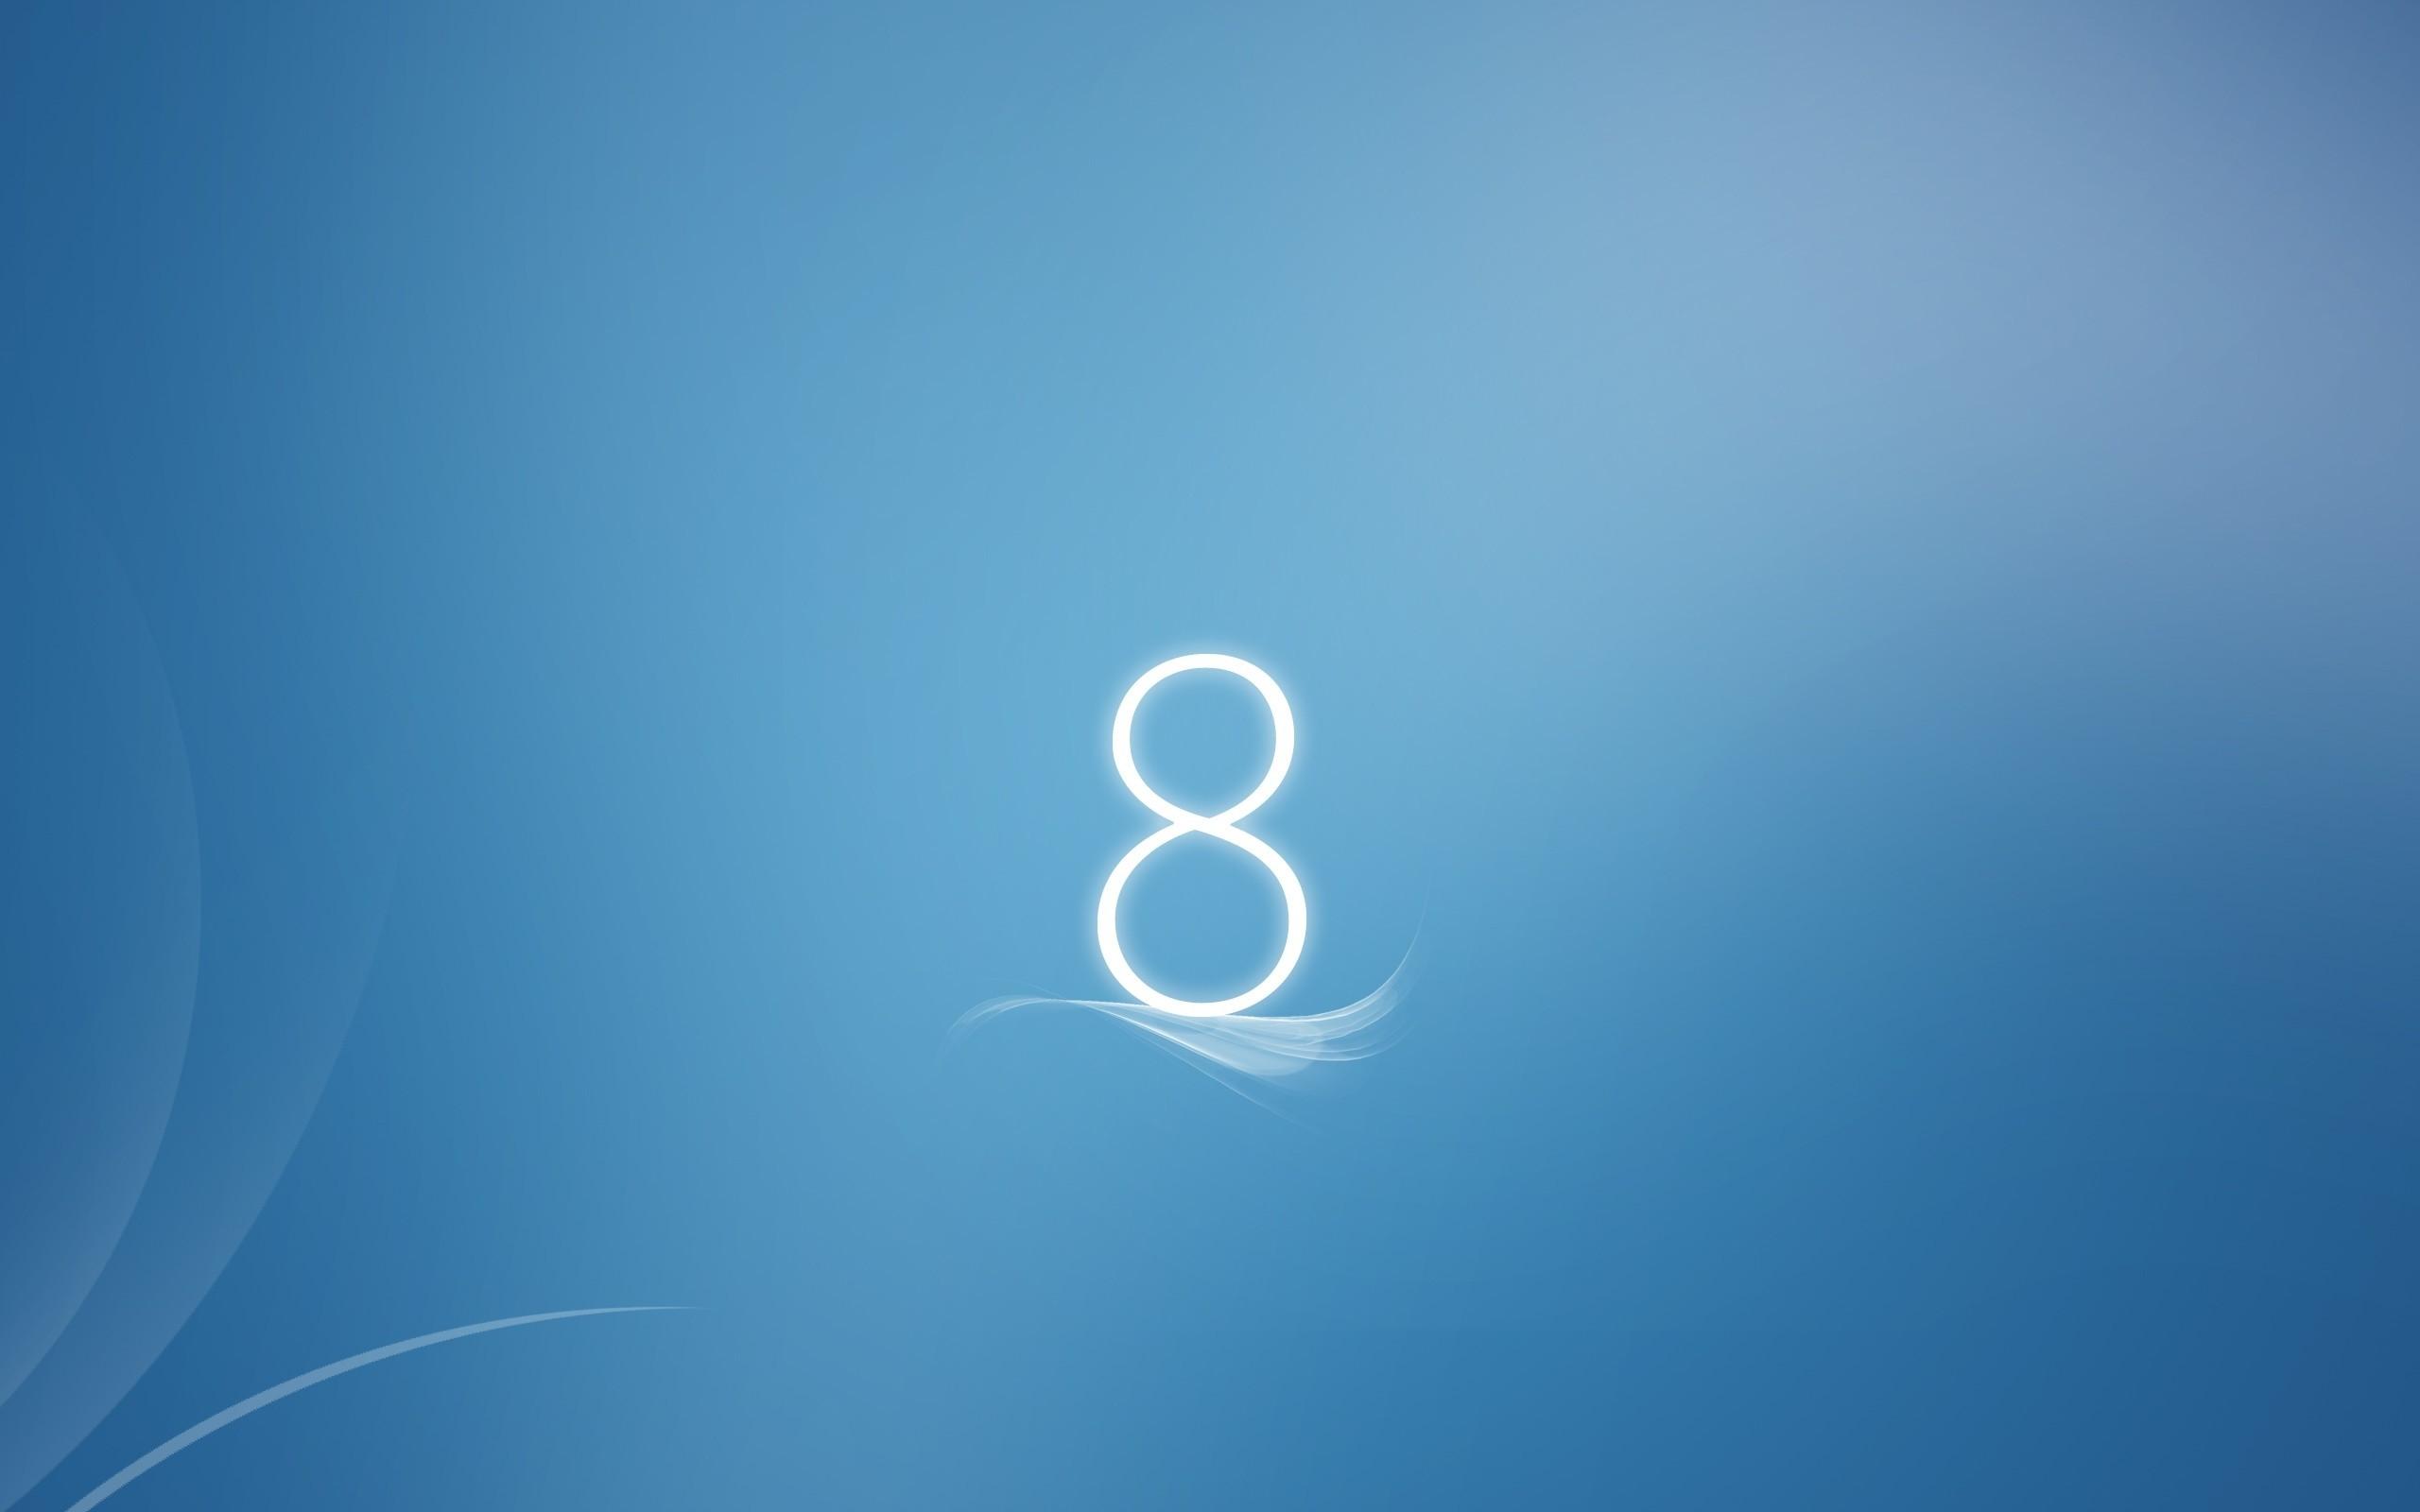 windows 8 smooth blue – Windows 8 Wallpaper (28120137) – Fanpop